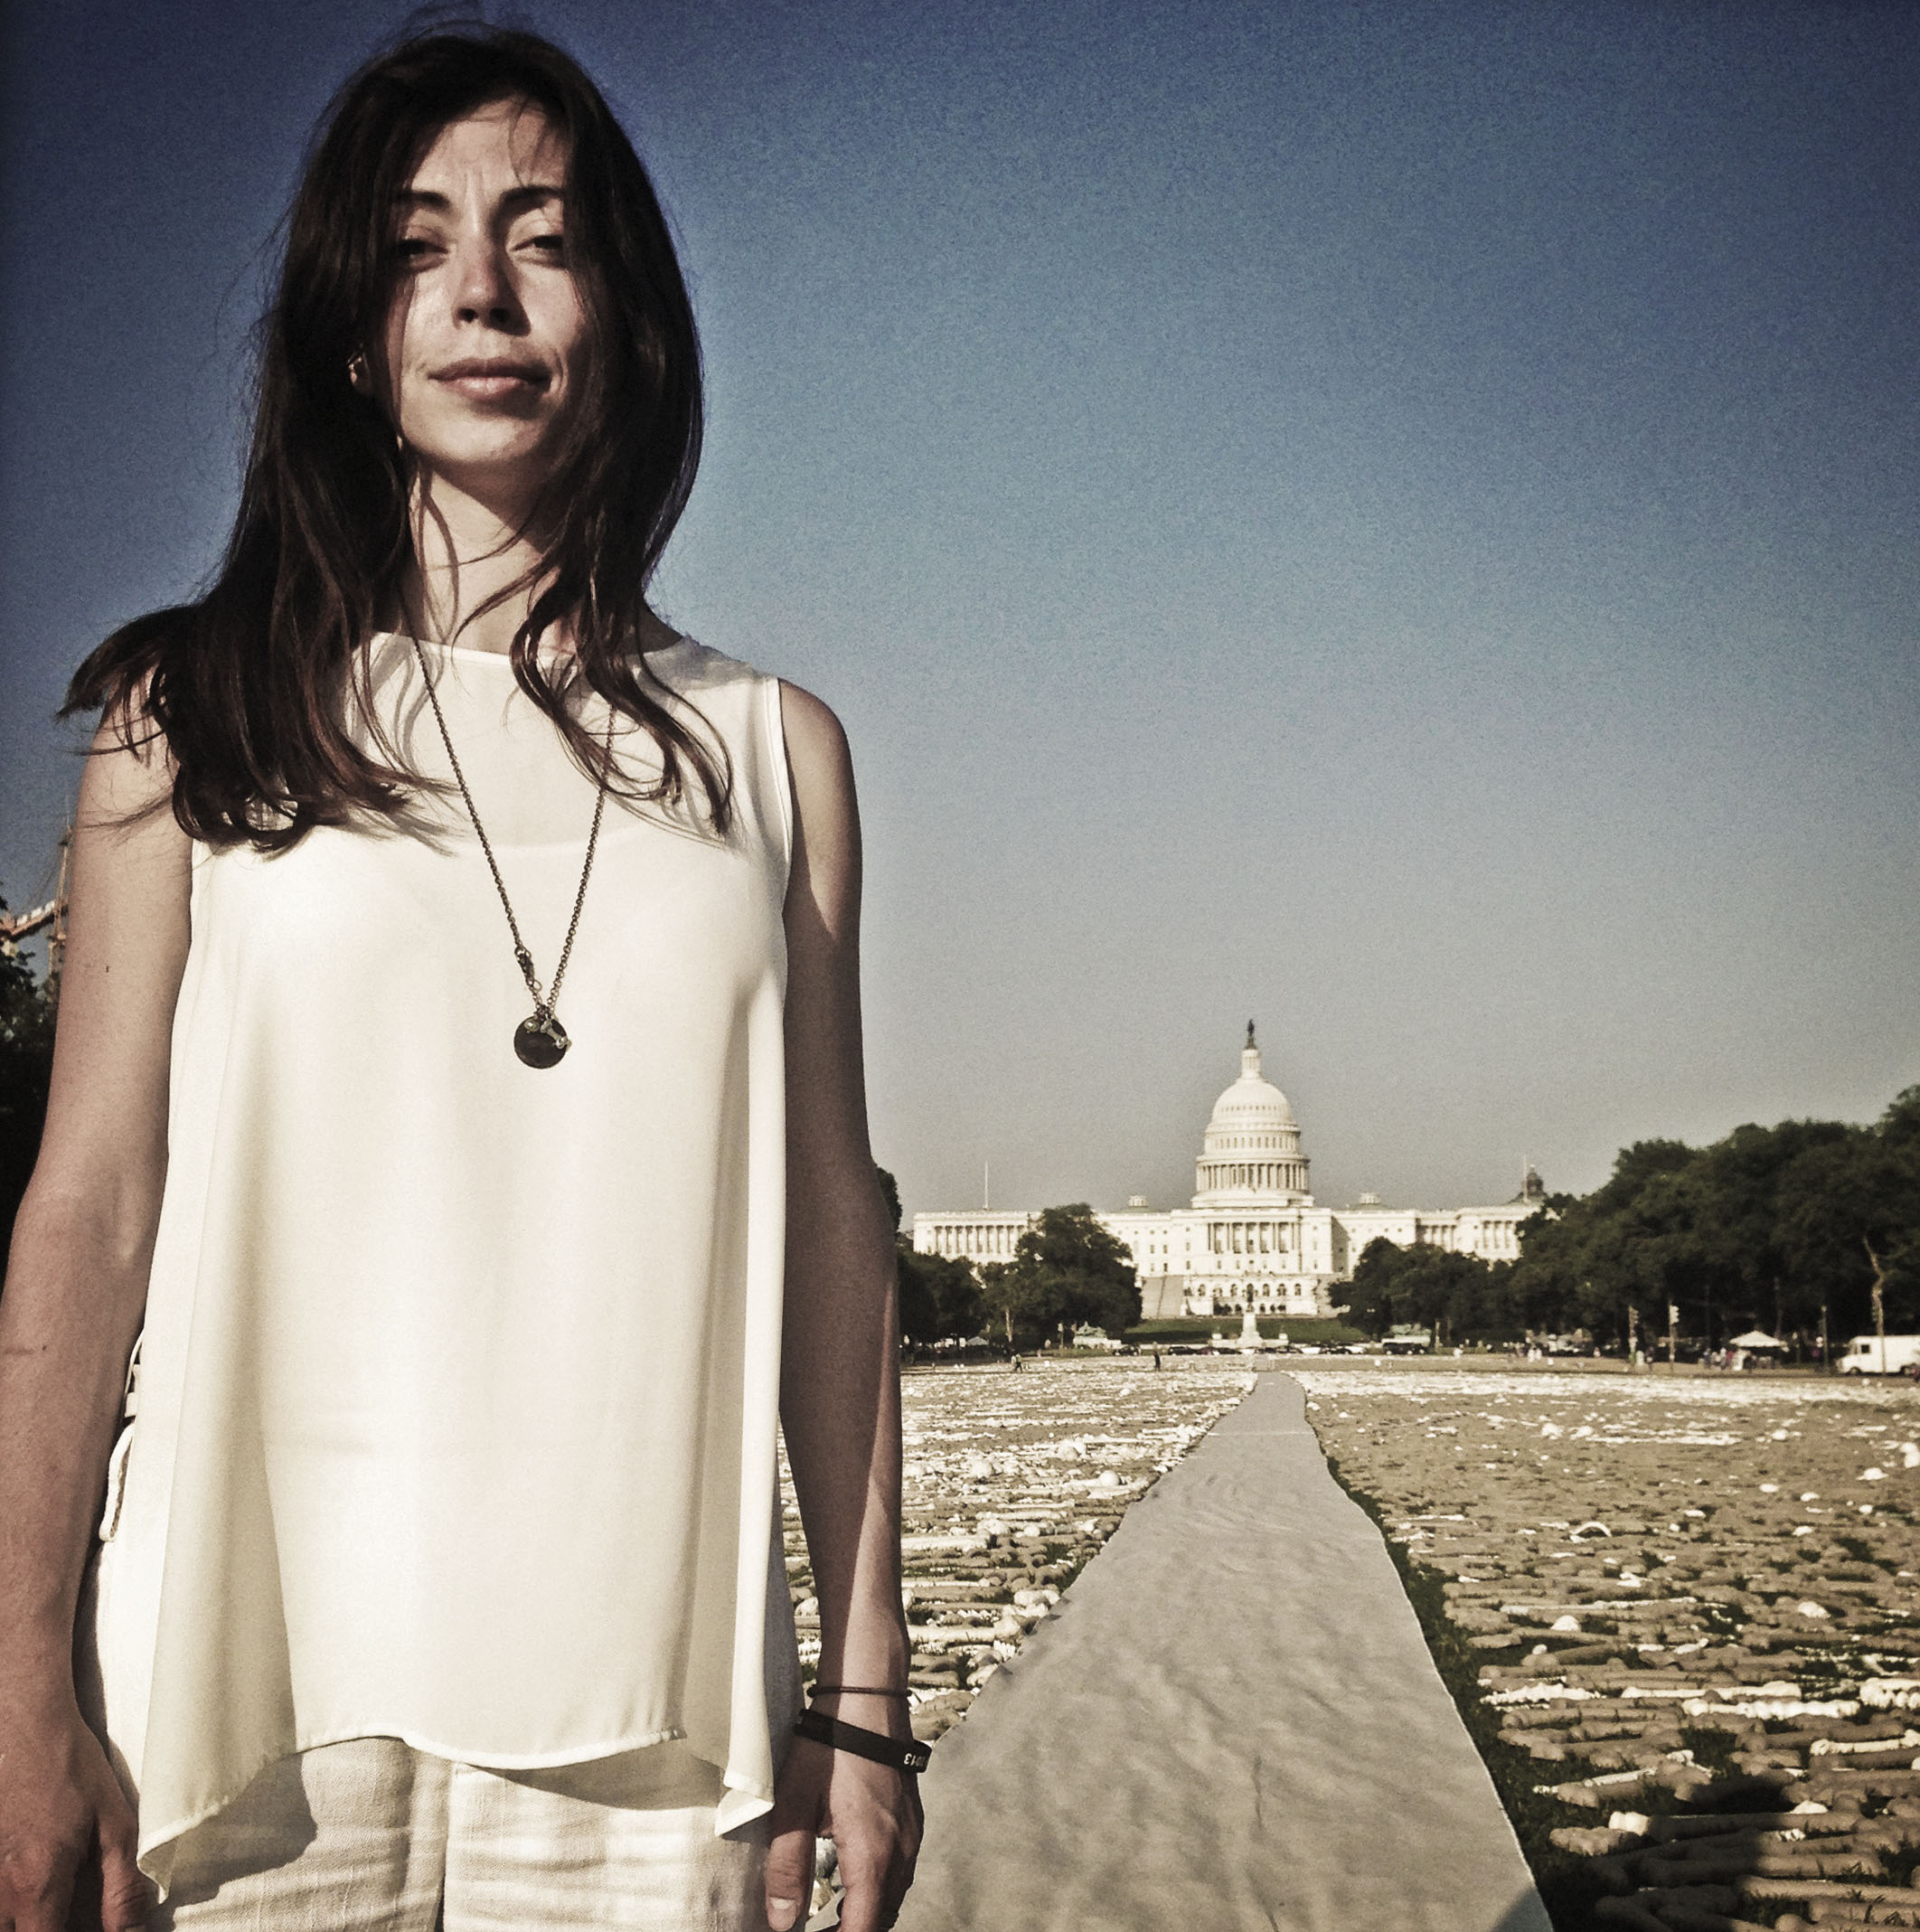 Naomi Natale, at the site of her One Million Bones installation on the National Mall in Washington DC. Photo: Teru Kuwayama